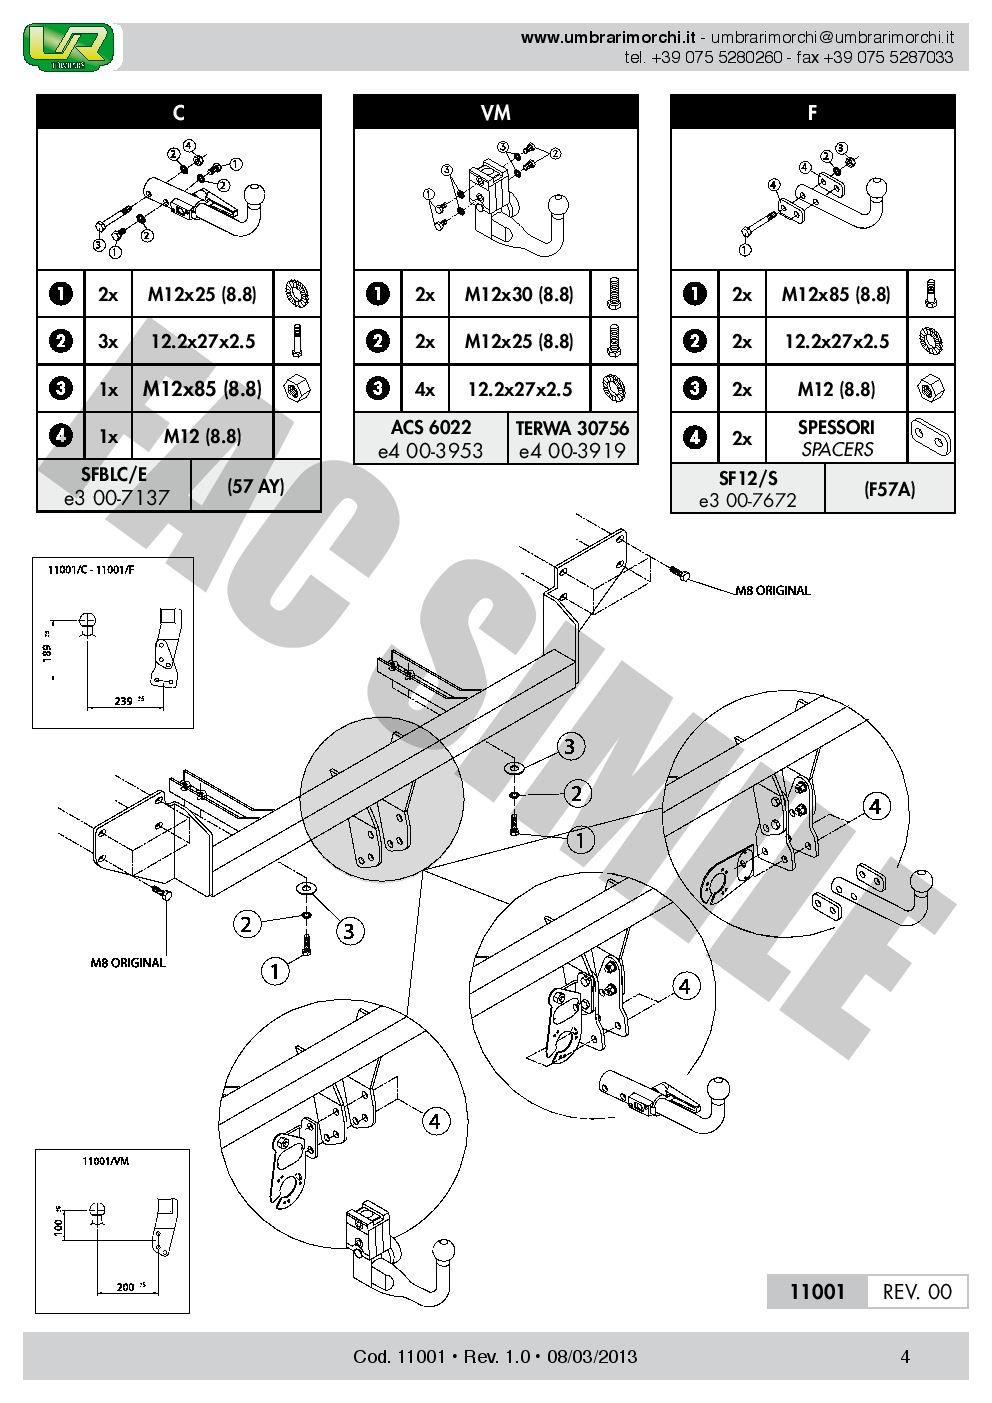 AHK Vertikale Anhängerkupplung 7p C2 E-Satz Mini Cooper R56 Limo 06 1100/_B1